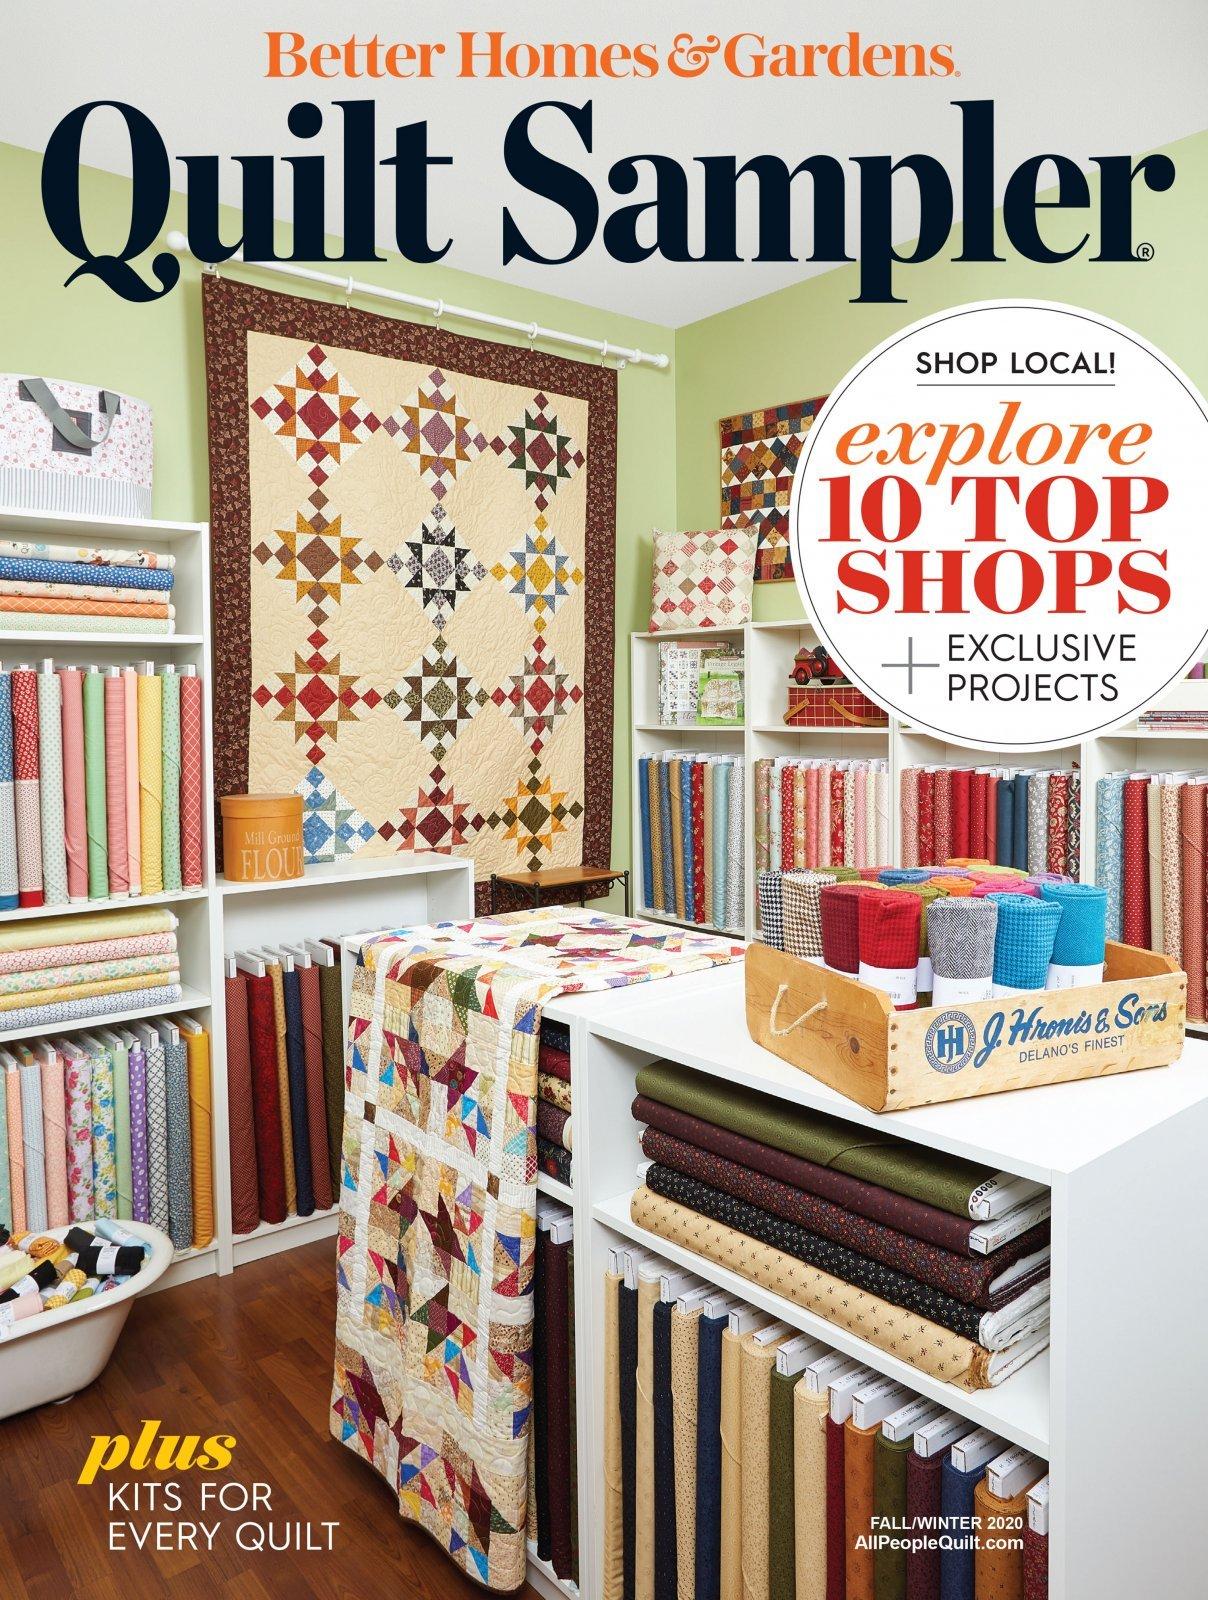 Quilt Sampler - Fall/Winter 2020